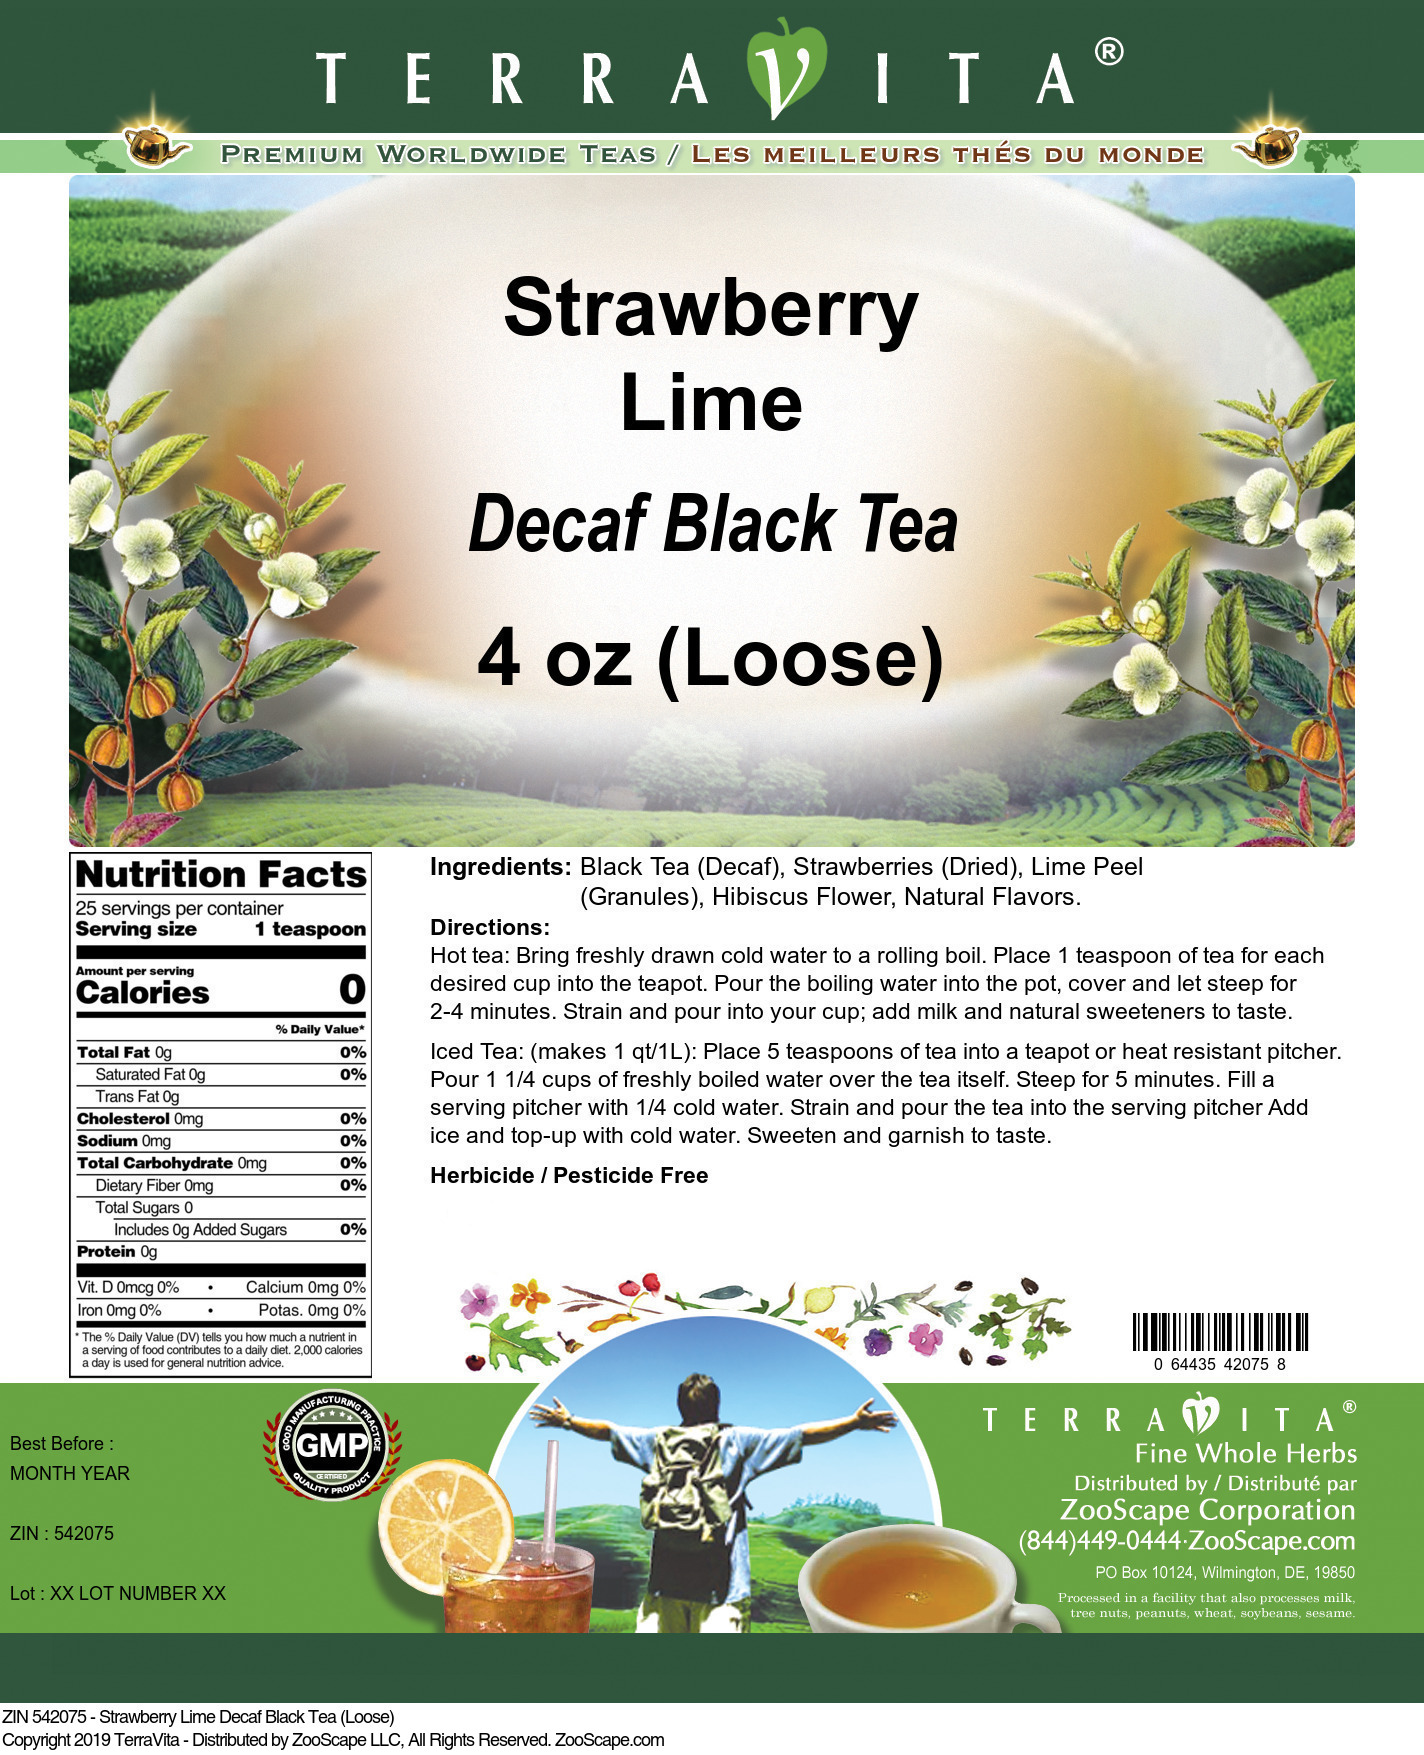 Strawberry Lime Decaf Black Tea